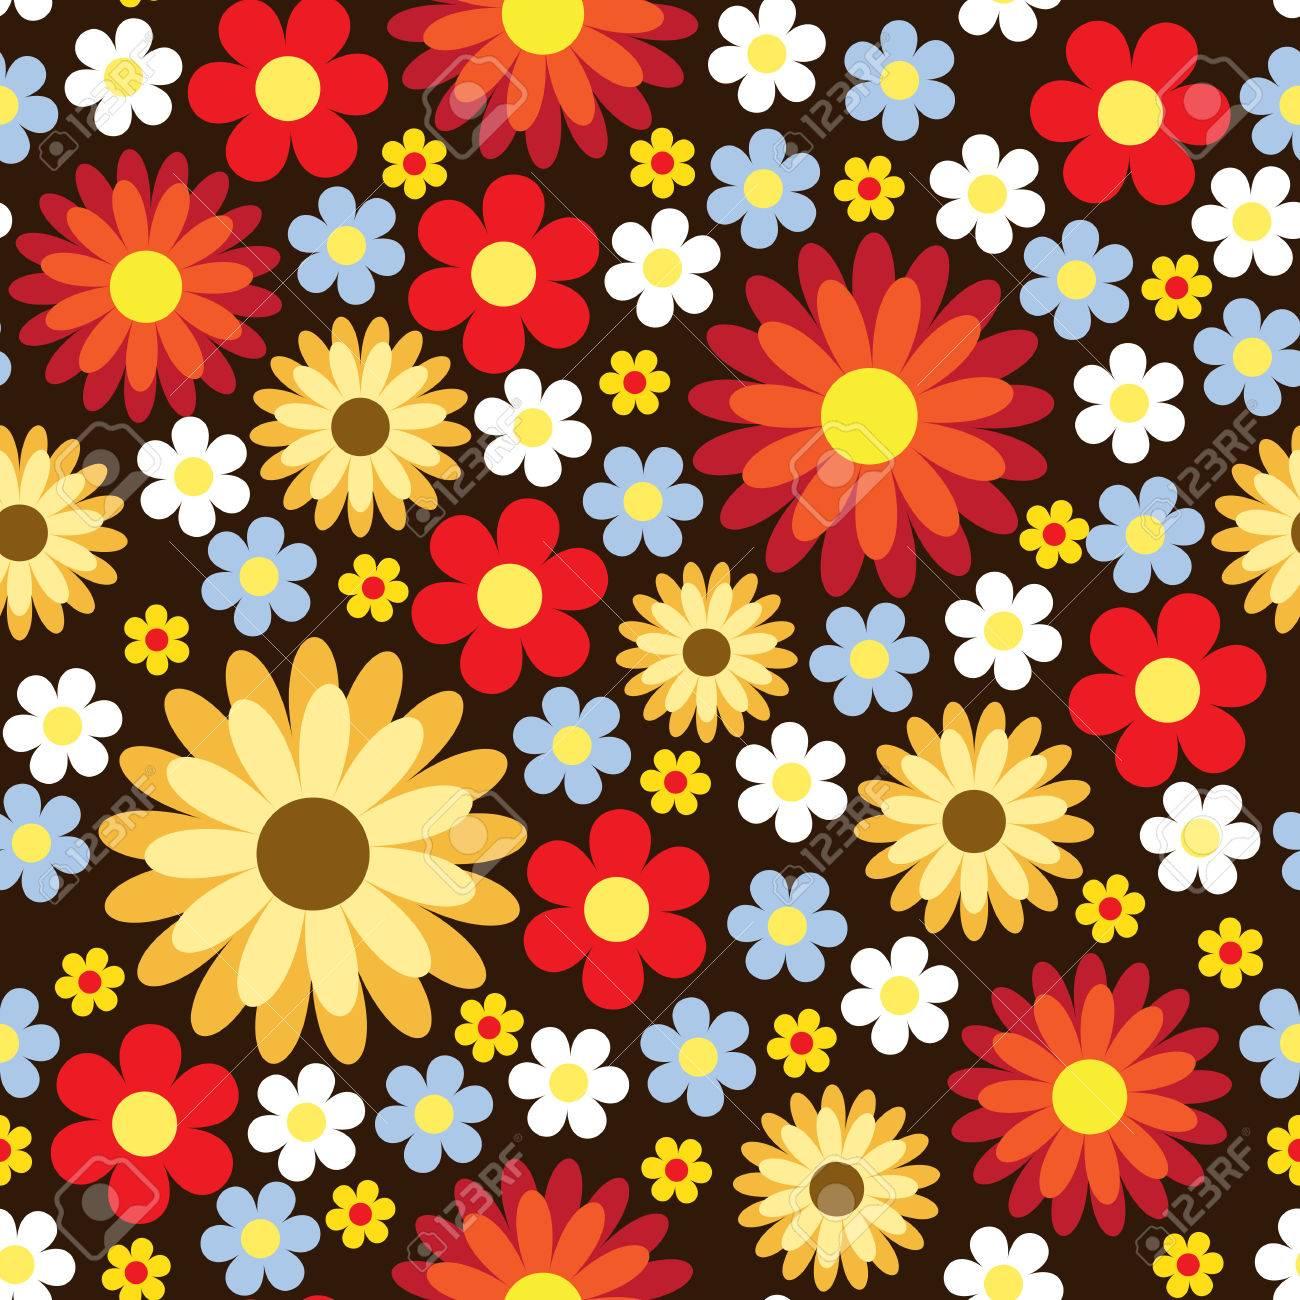 Seamless pattern with pretty flowers on dark background royalty free seamless pattern with pretty flowers on dark background stock vector 28403580 mightylinksfo